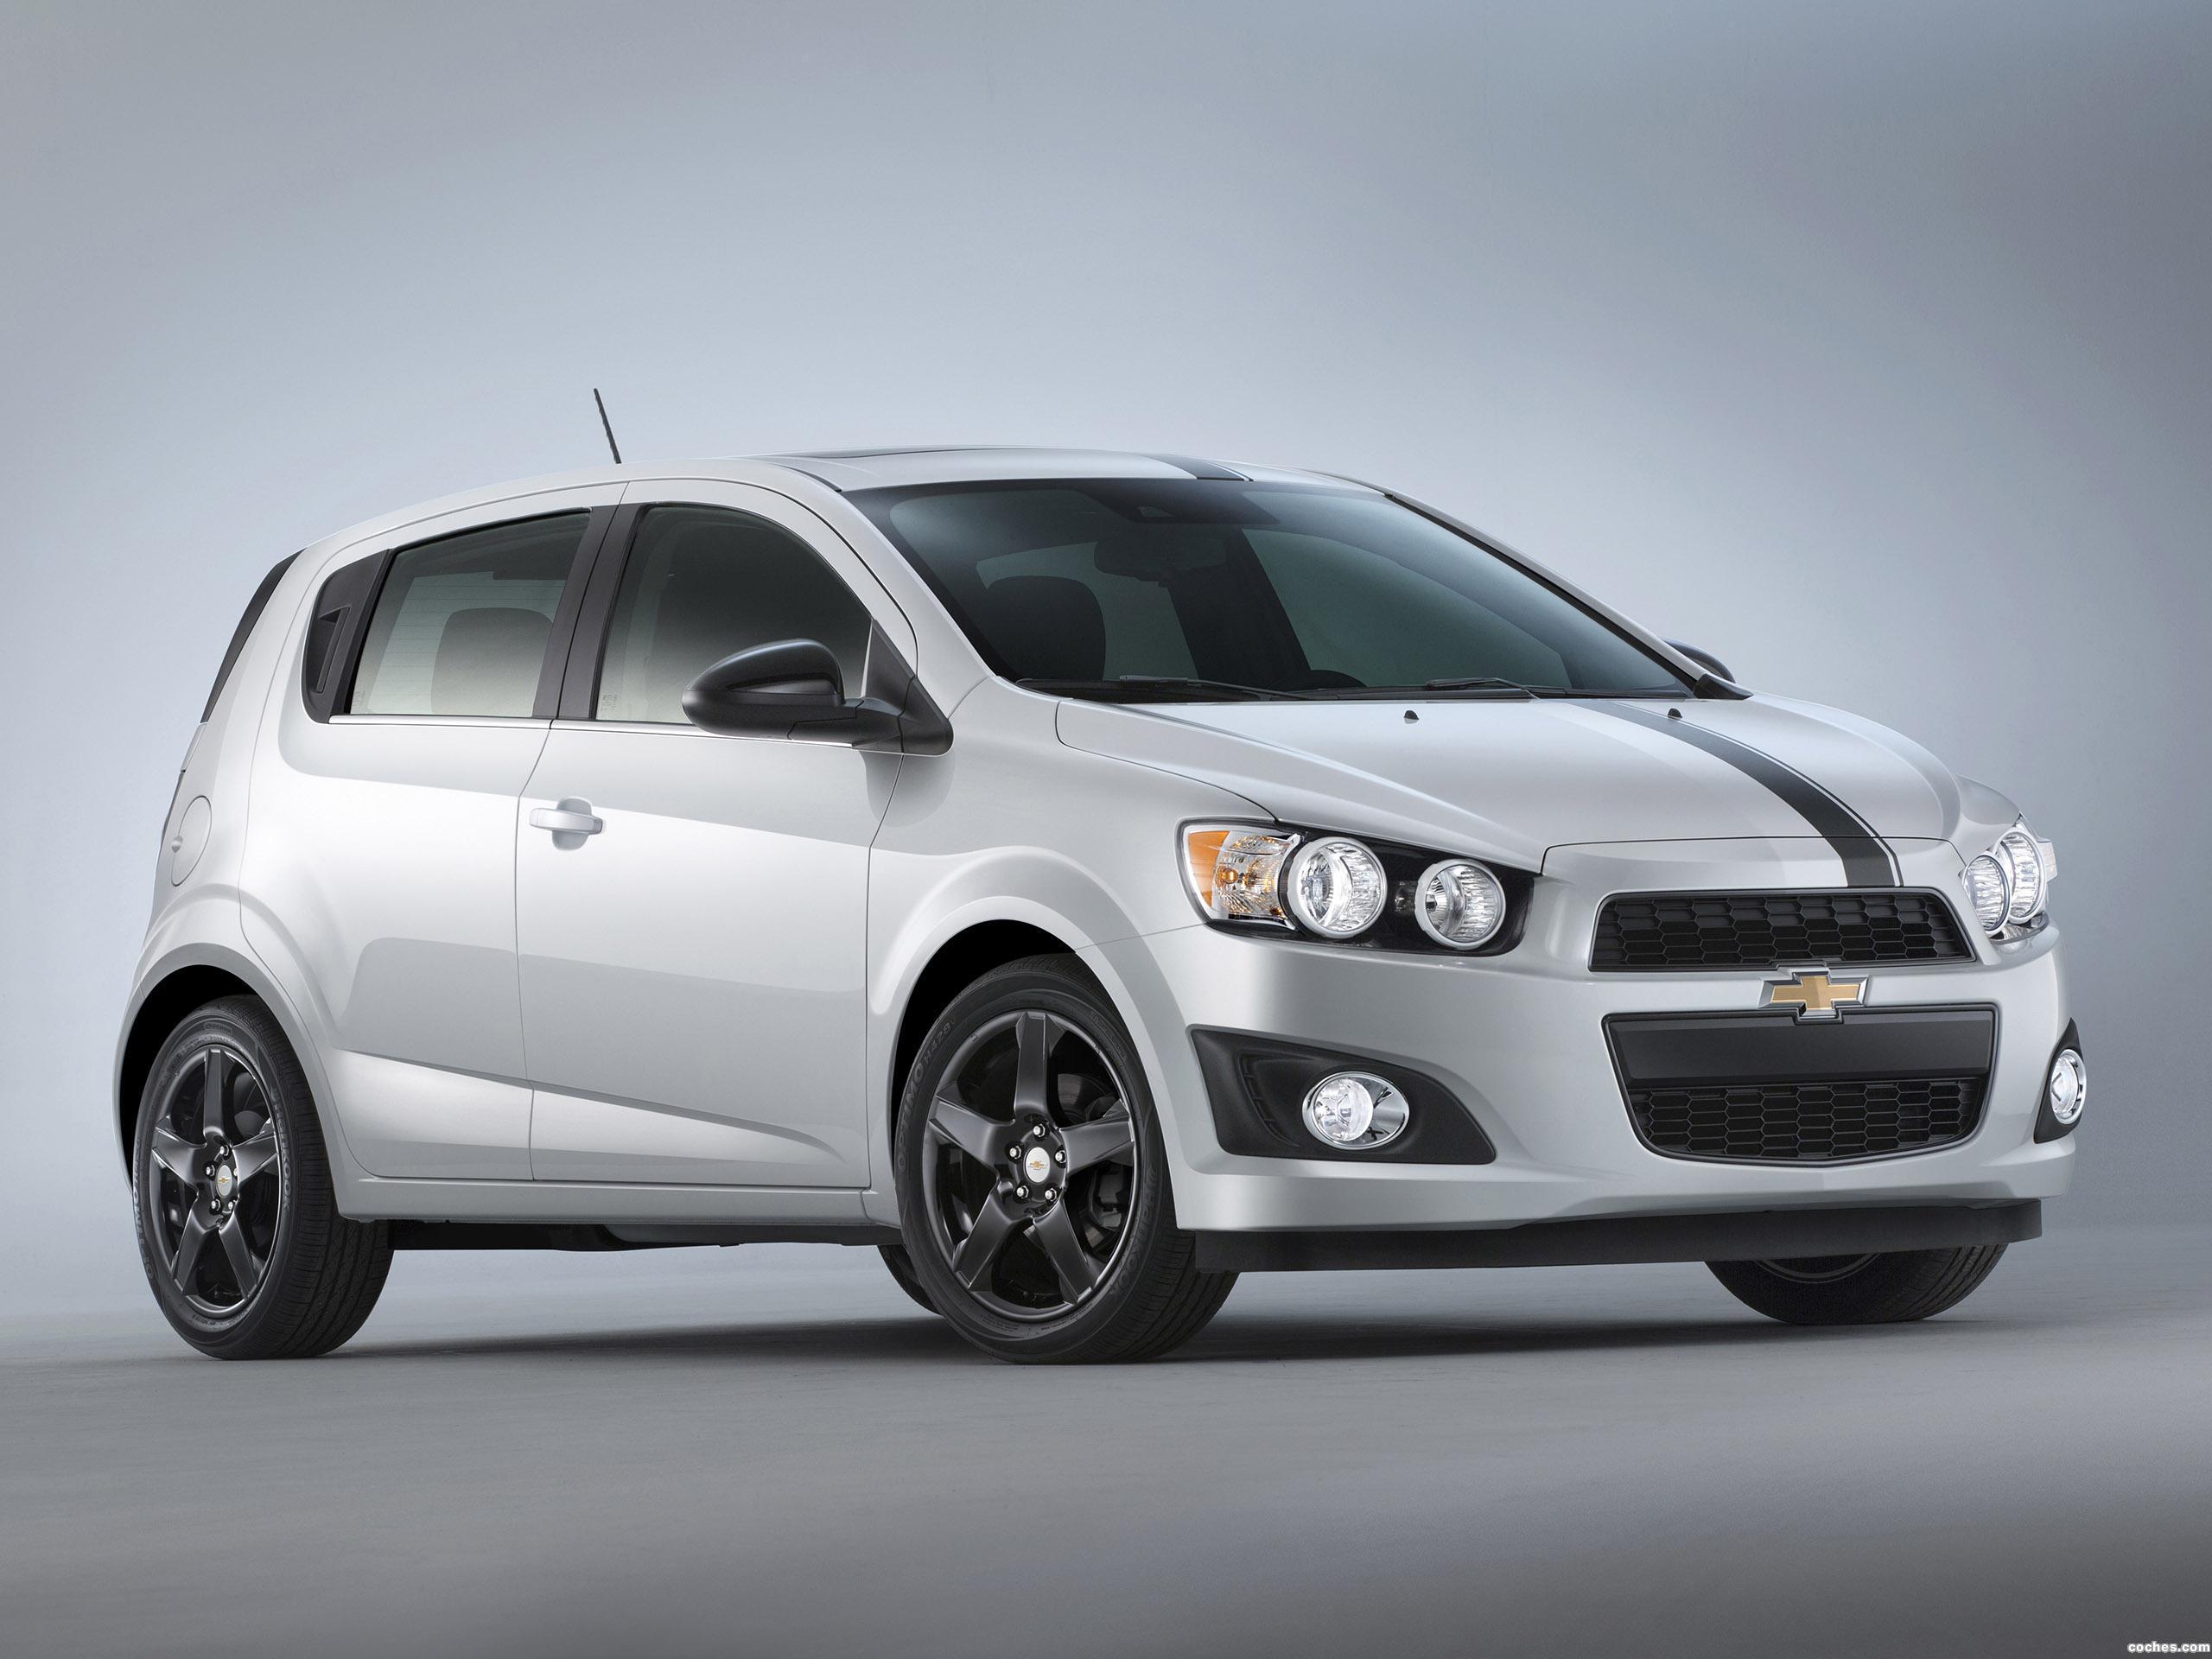 Foto 0 de Chevrolet Sonic Accessories Concept 2014